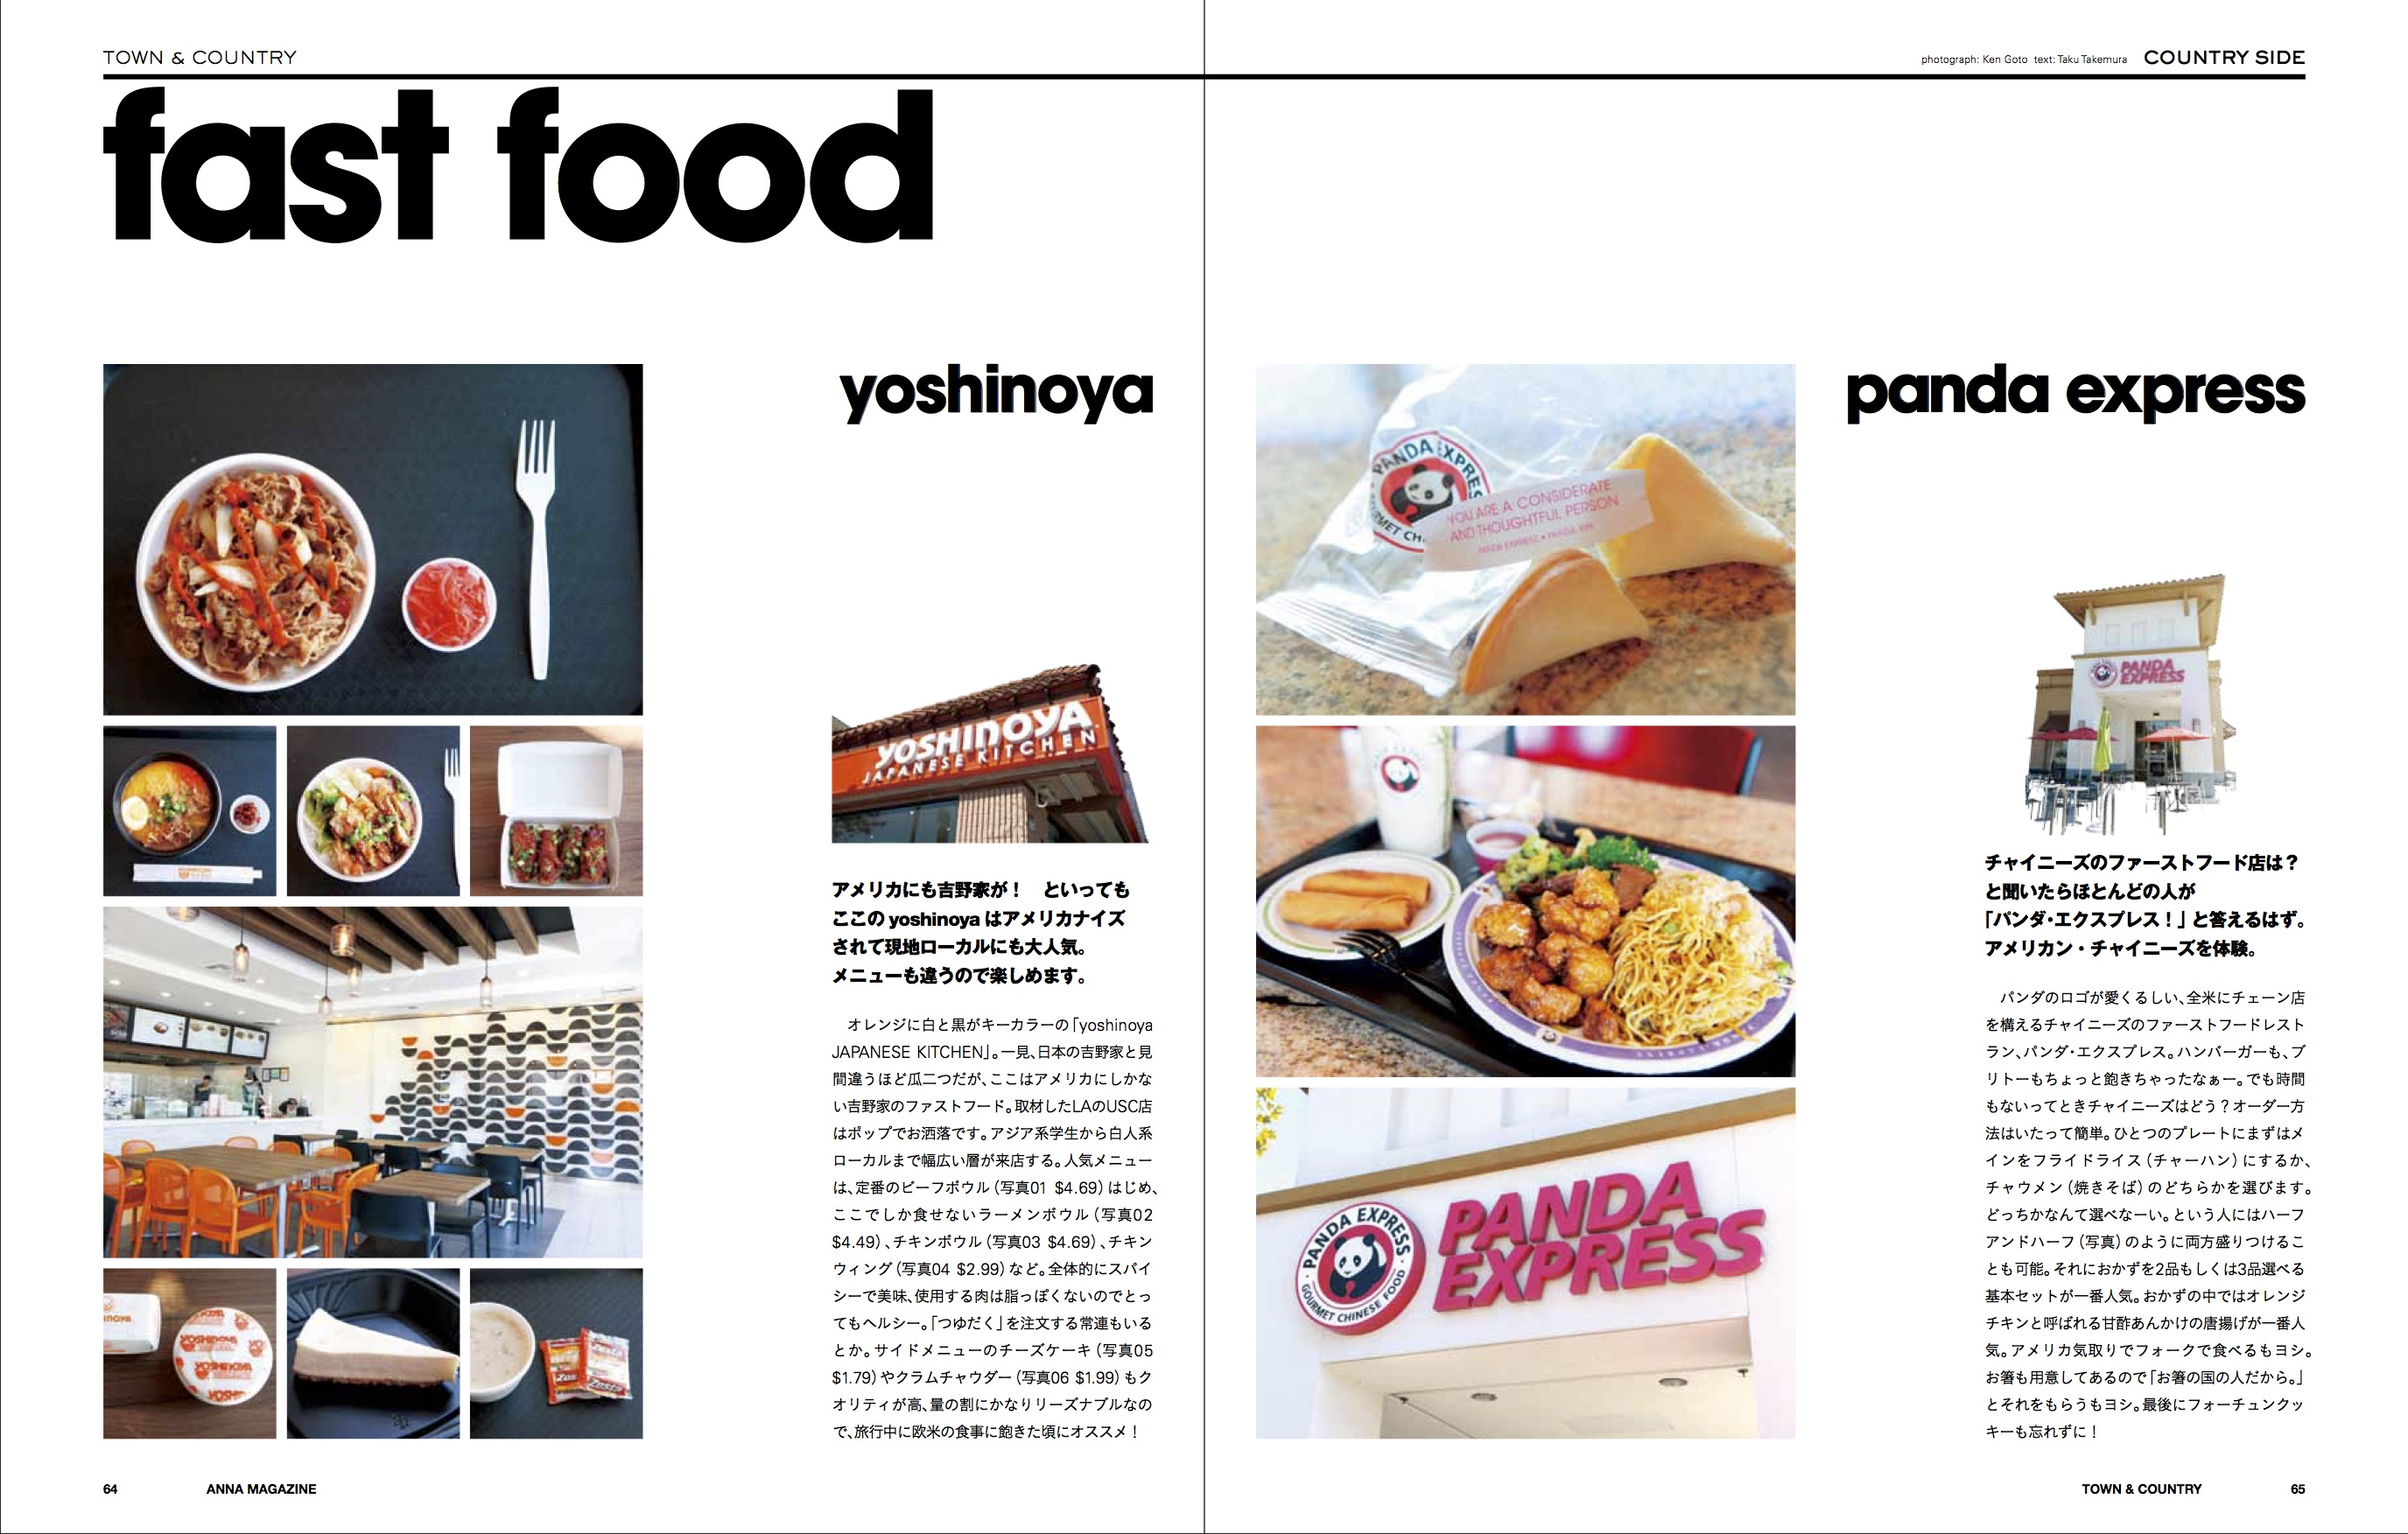 anna magazine Vol.4 P18